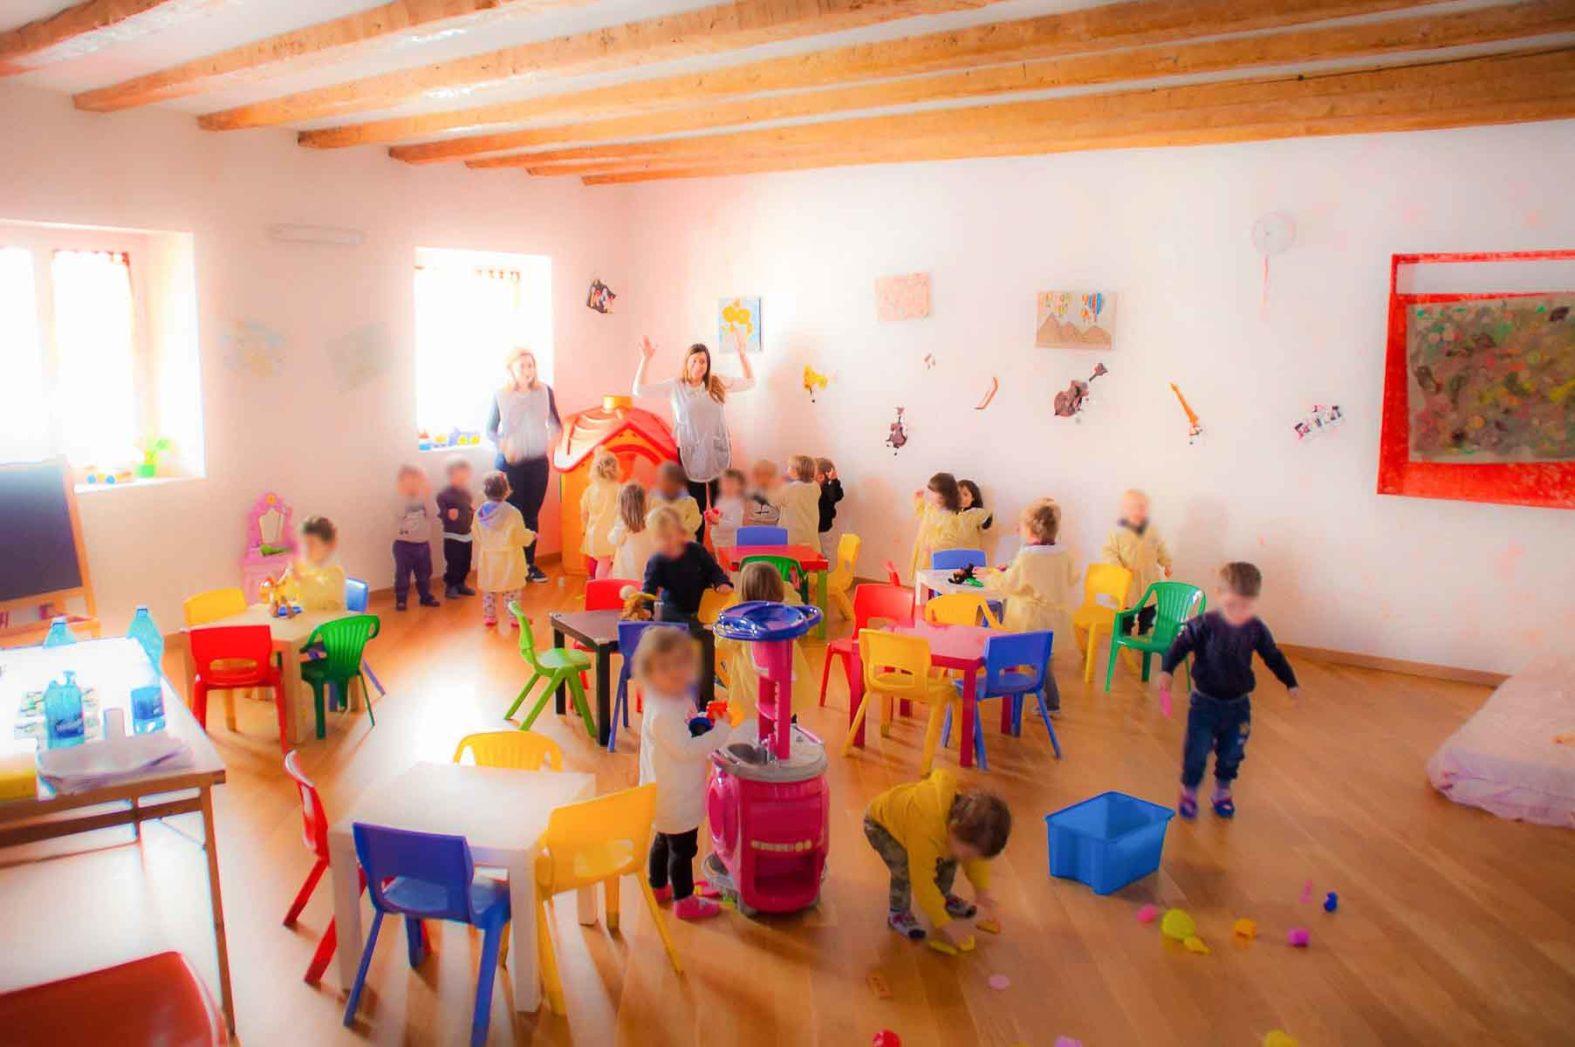 Scuola-materna-Folli-folletti-Trieste-i-nostri-bimbi-sono-sempre-felici